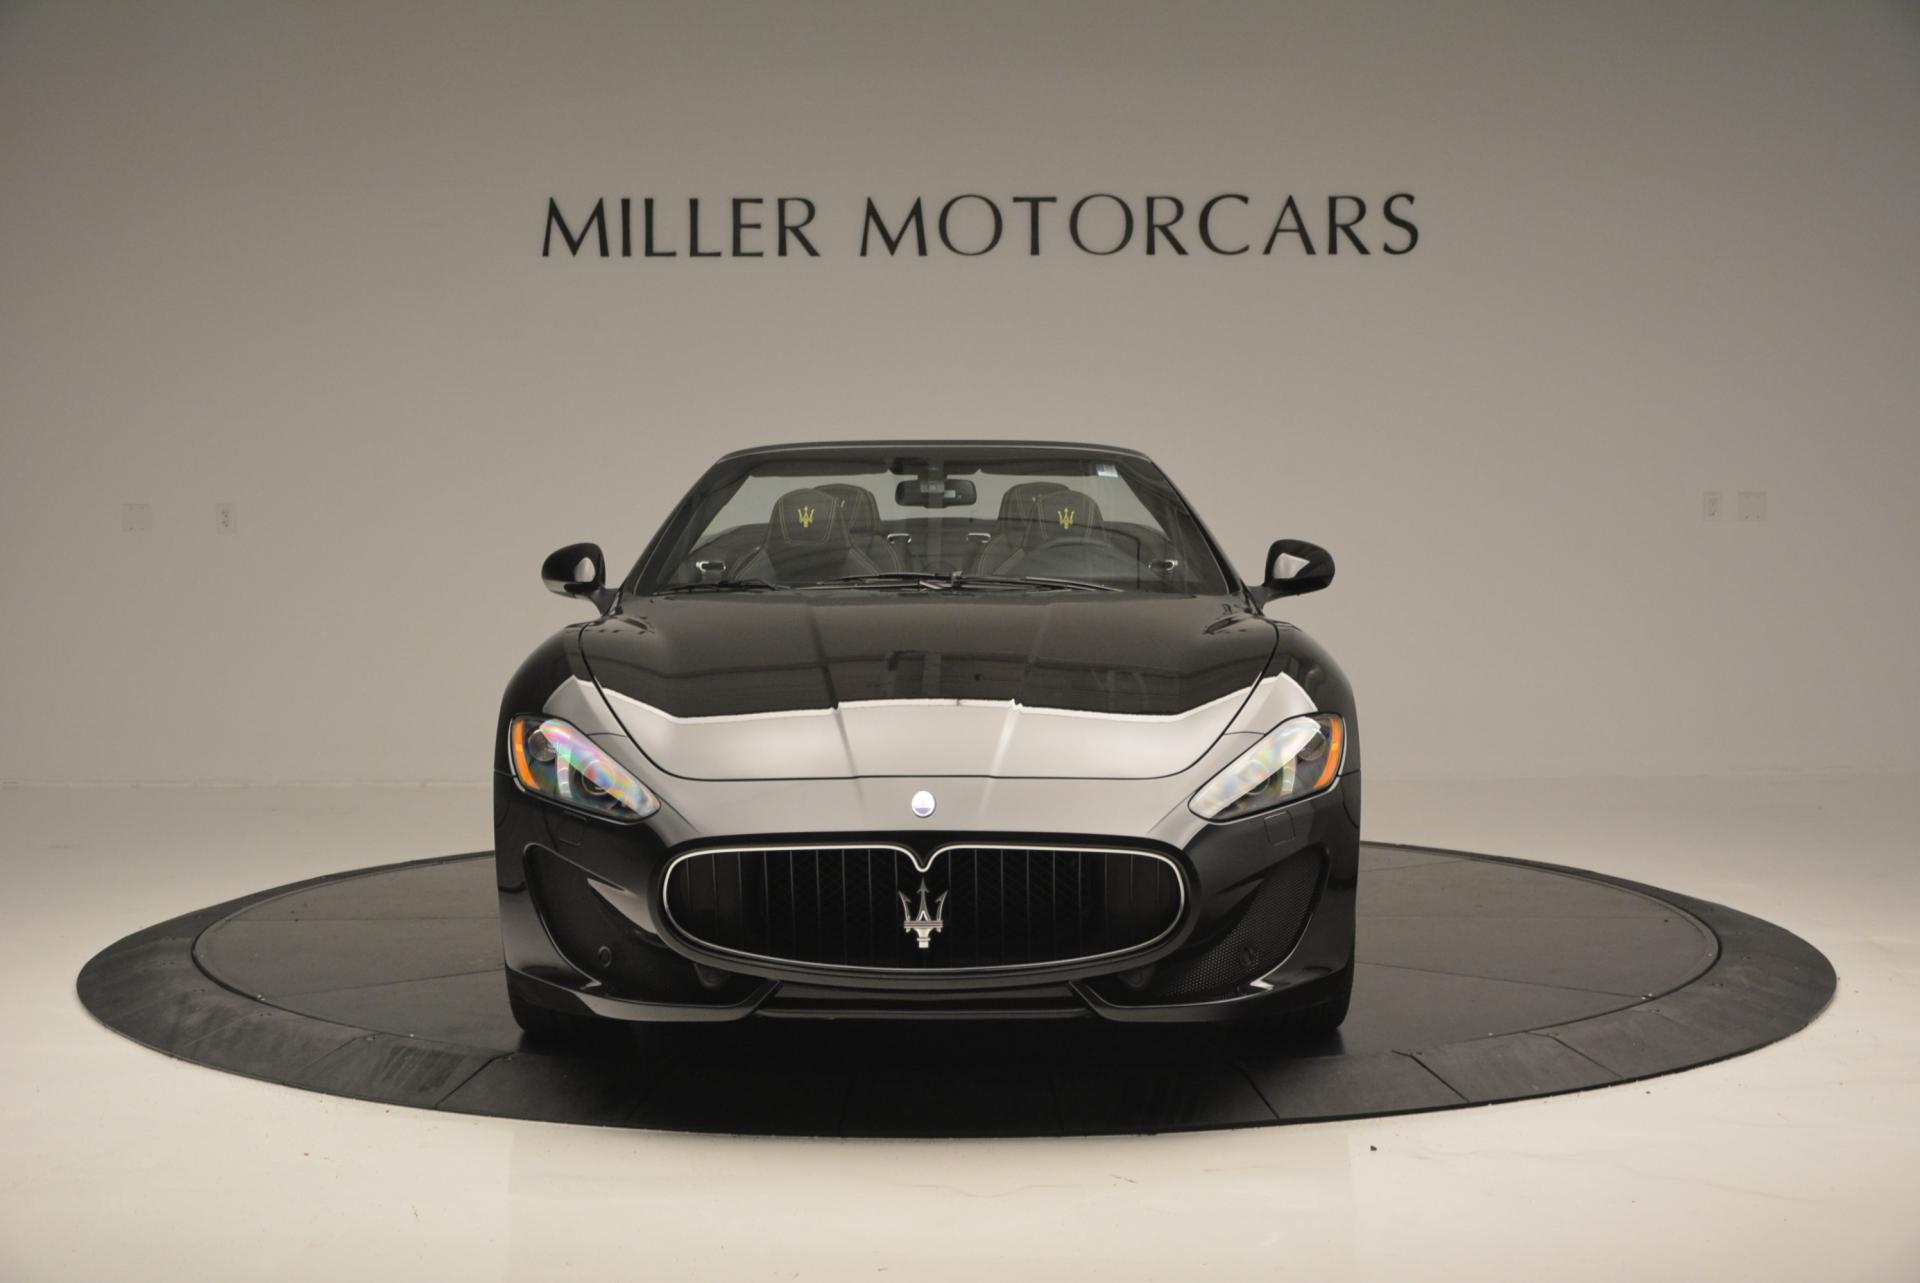 New 2017 Maserati GranTurismo Convertible Sport For Sale In Westport, CT 159_p18